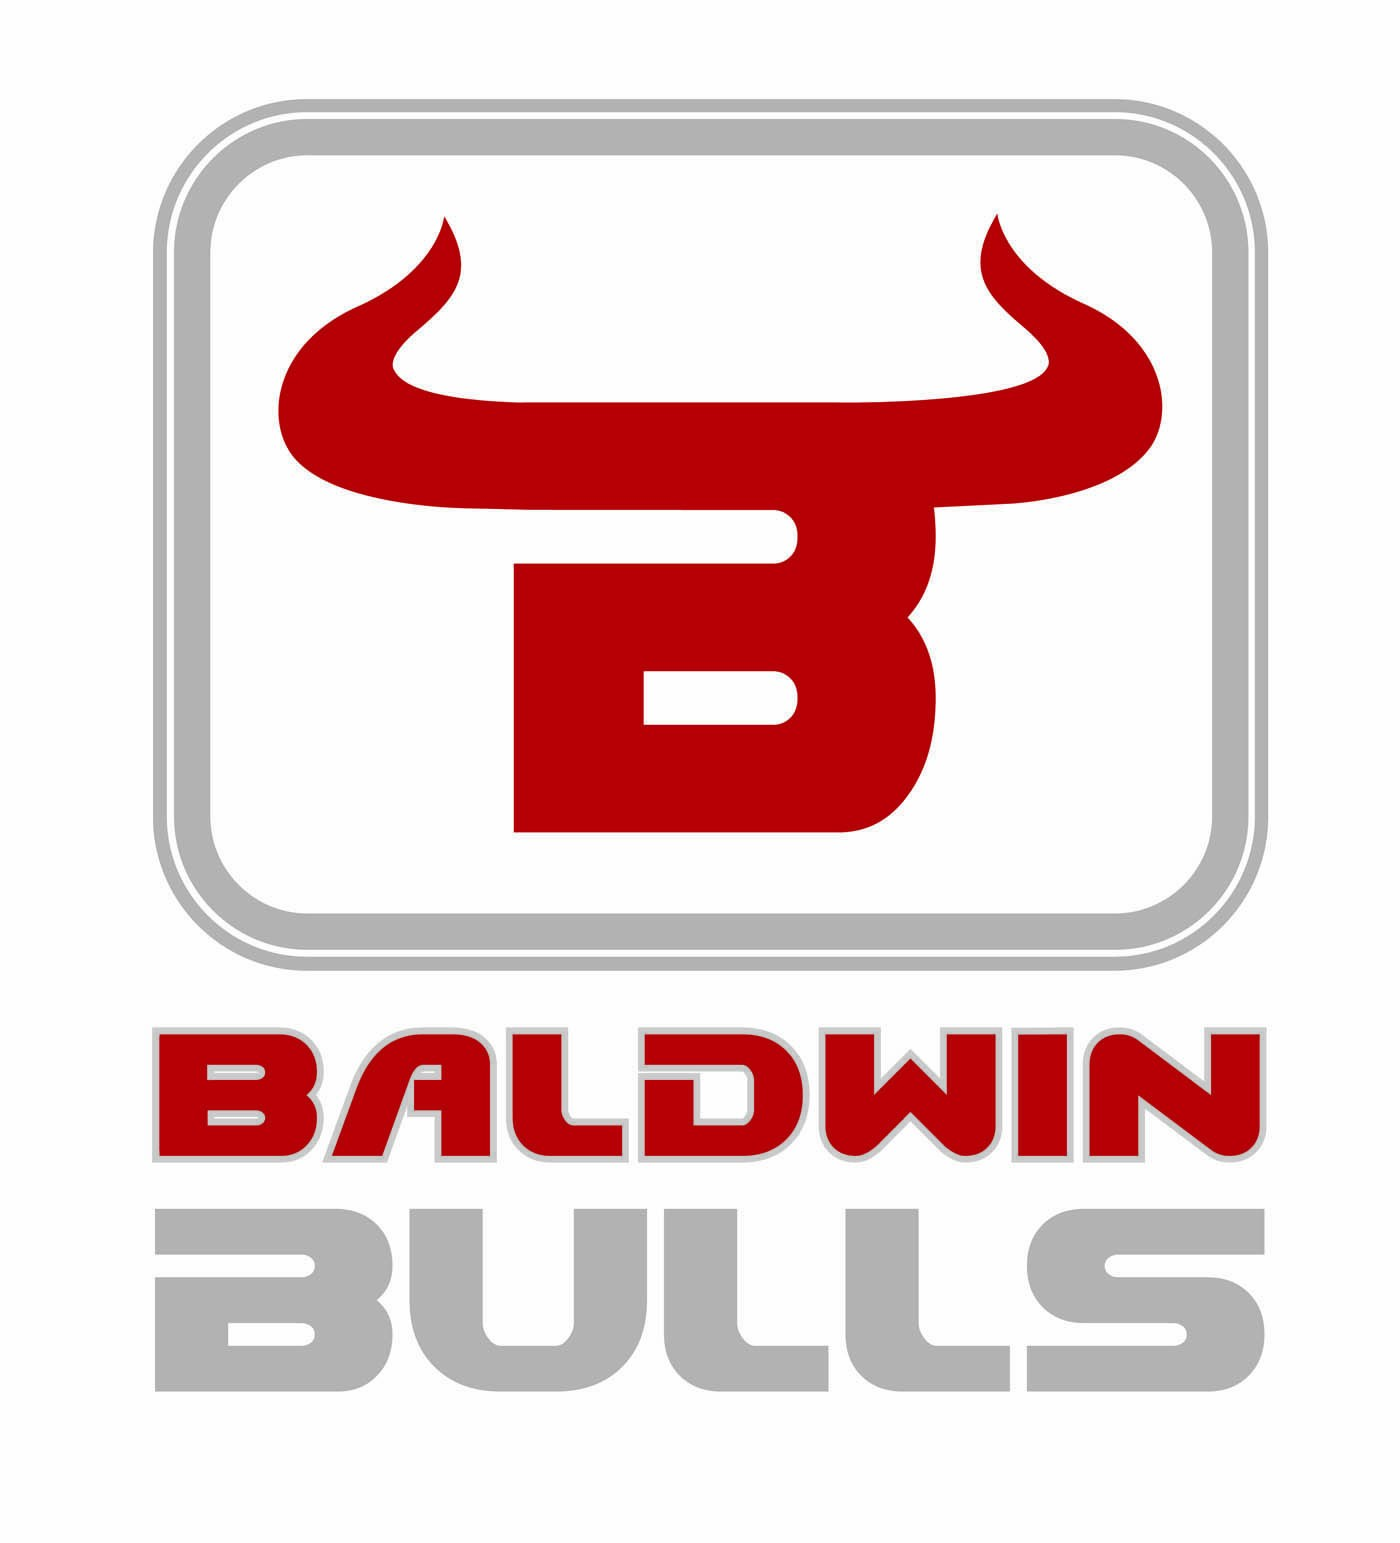 Baldwin Bulls logo